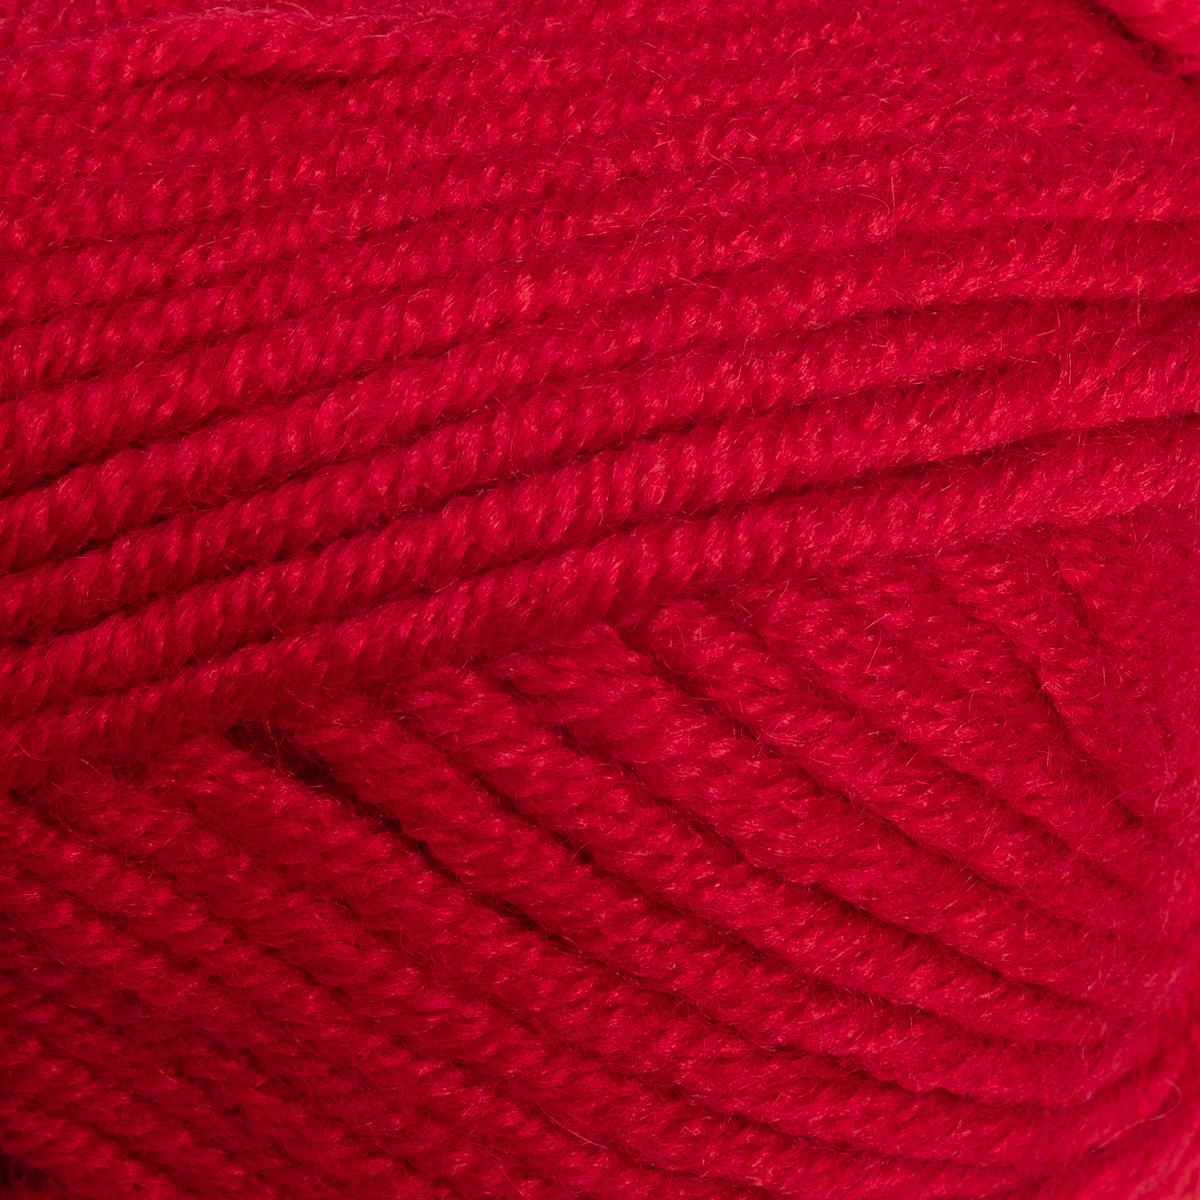 3pk-Lion-Brand-Woolspun-Acrylic-amp-Wool-Yarn-Bulky-5-Knit-Crocheting-Skeins-Soft thumbnail 87